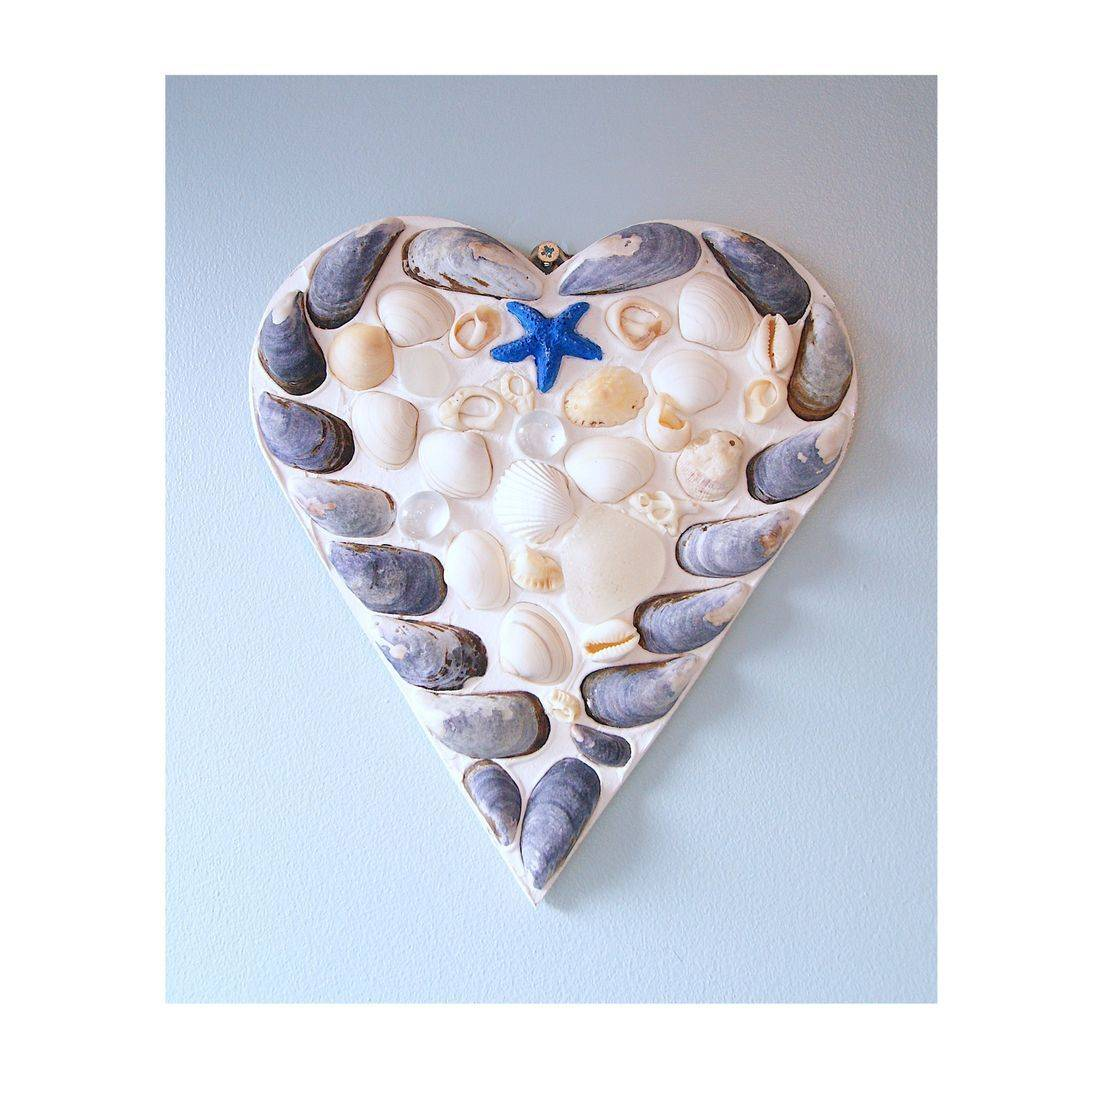 28 Mosaic Shell blue & white Heart